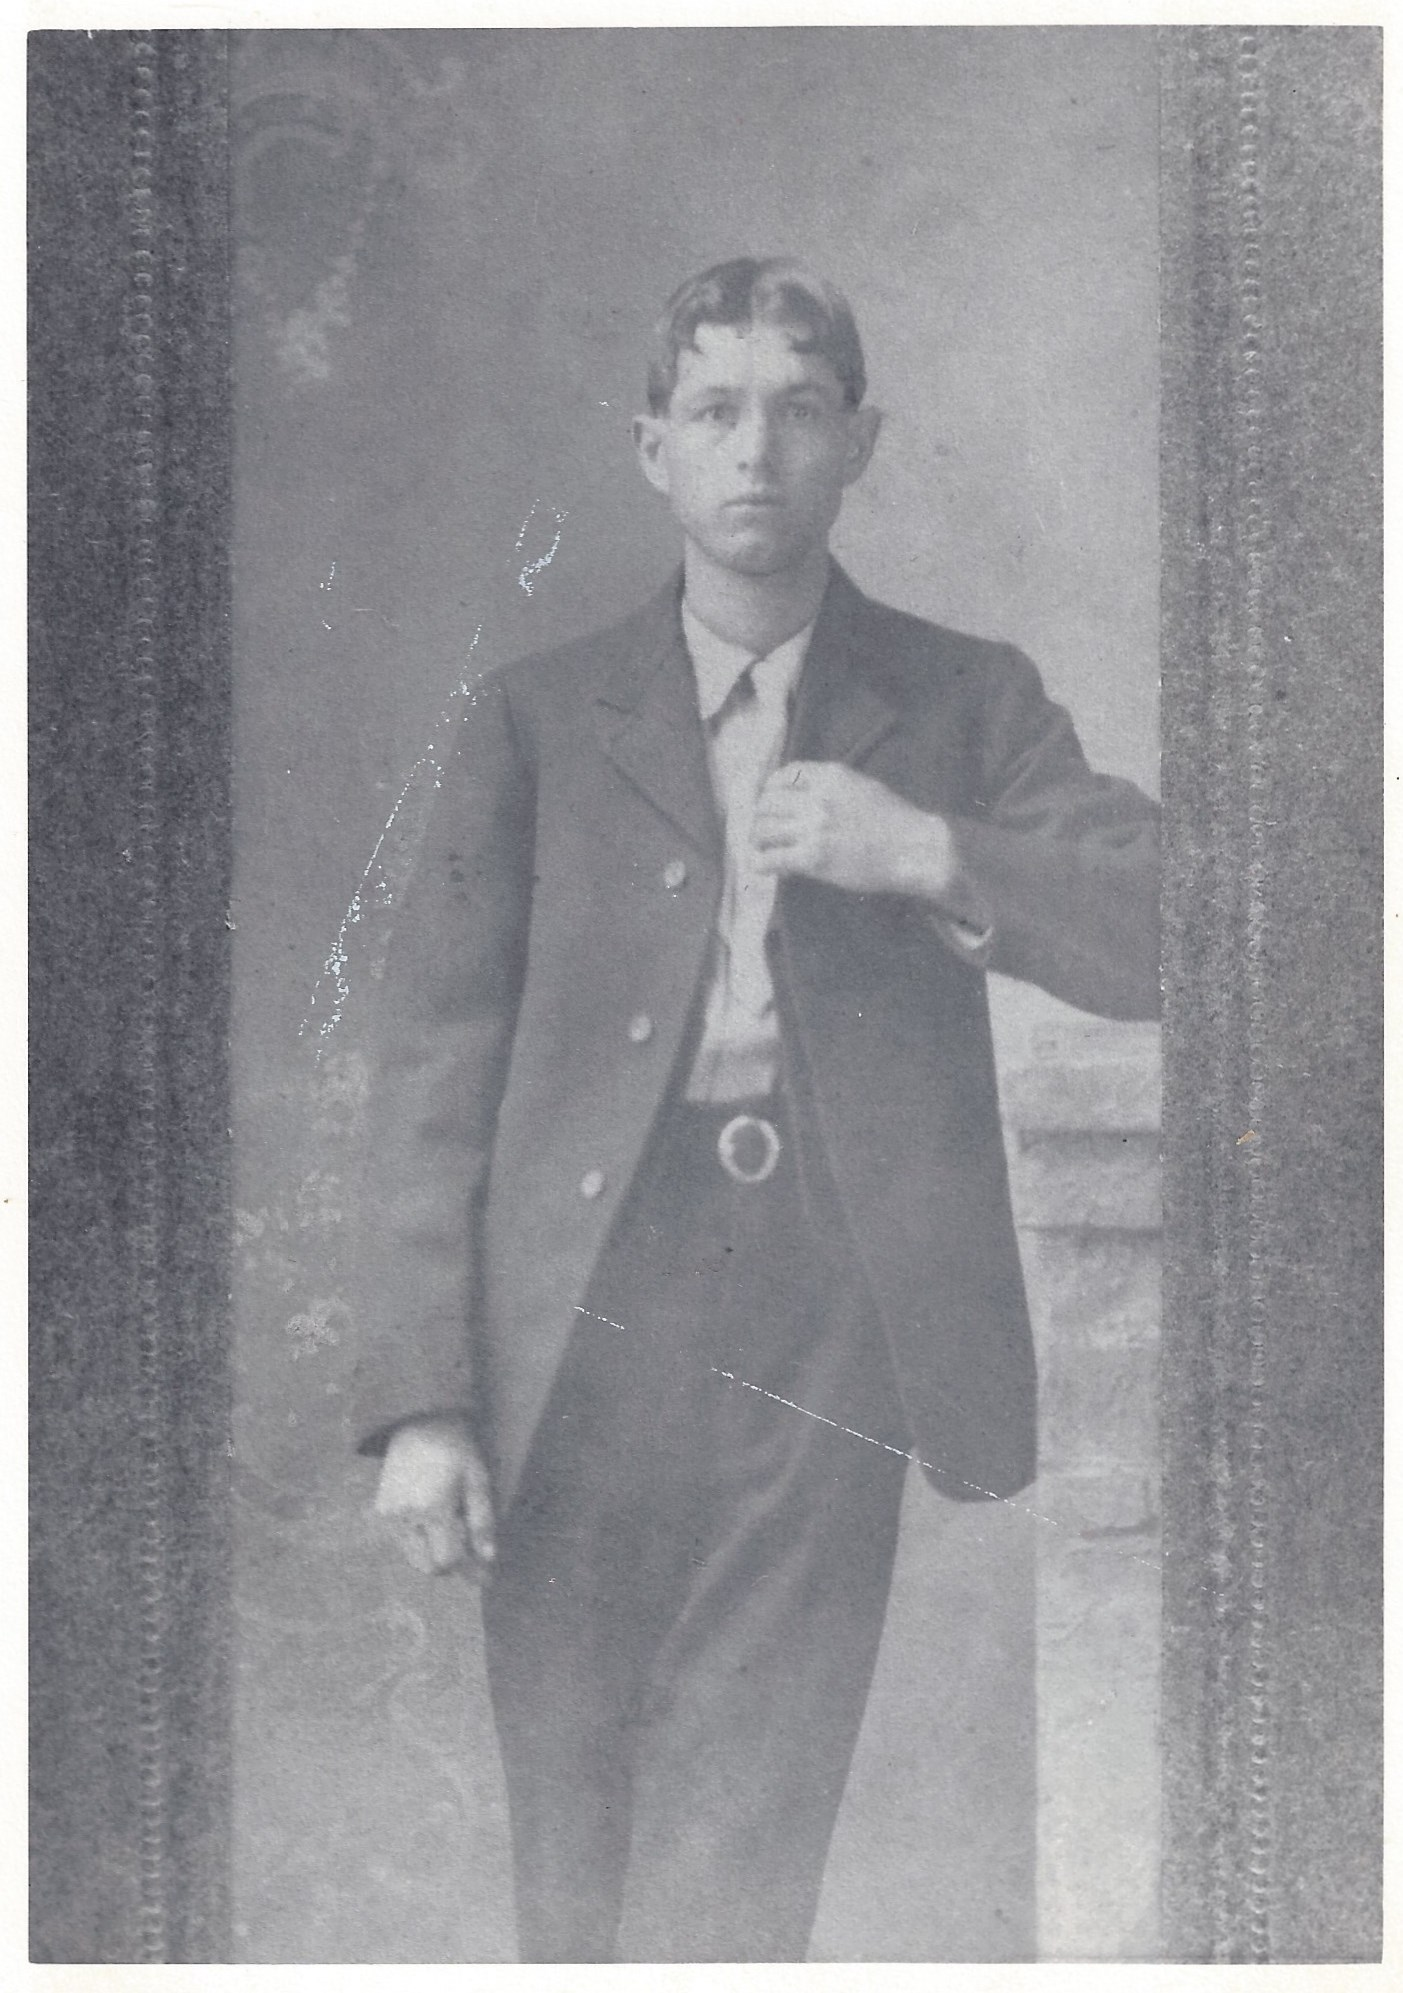 Robert Milligan Hatcher